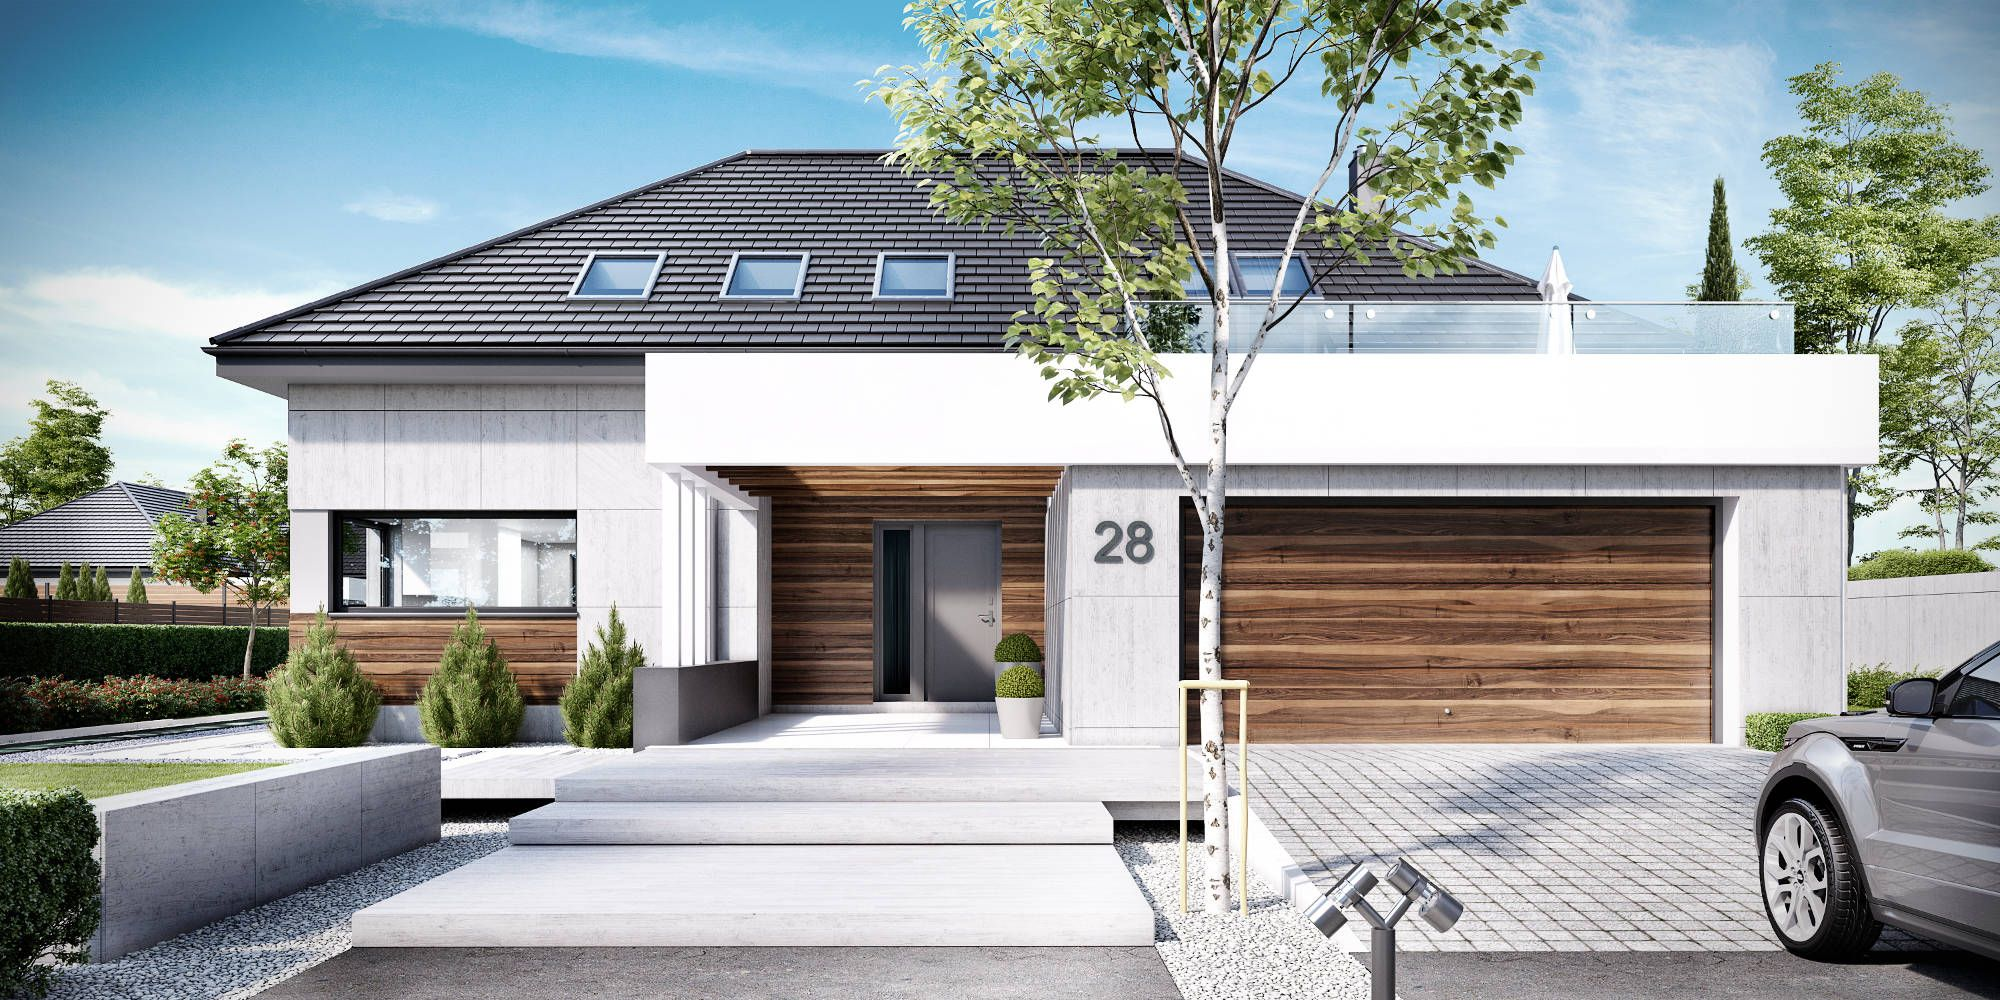 Grundriss Bungalow Mit Dachgeschoss Haus House Home Und